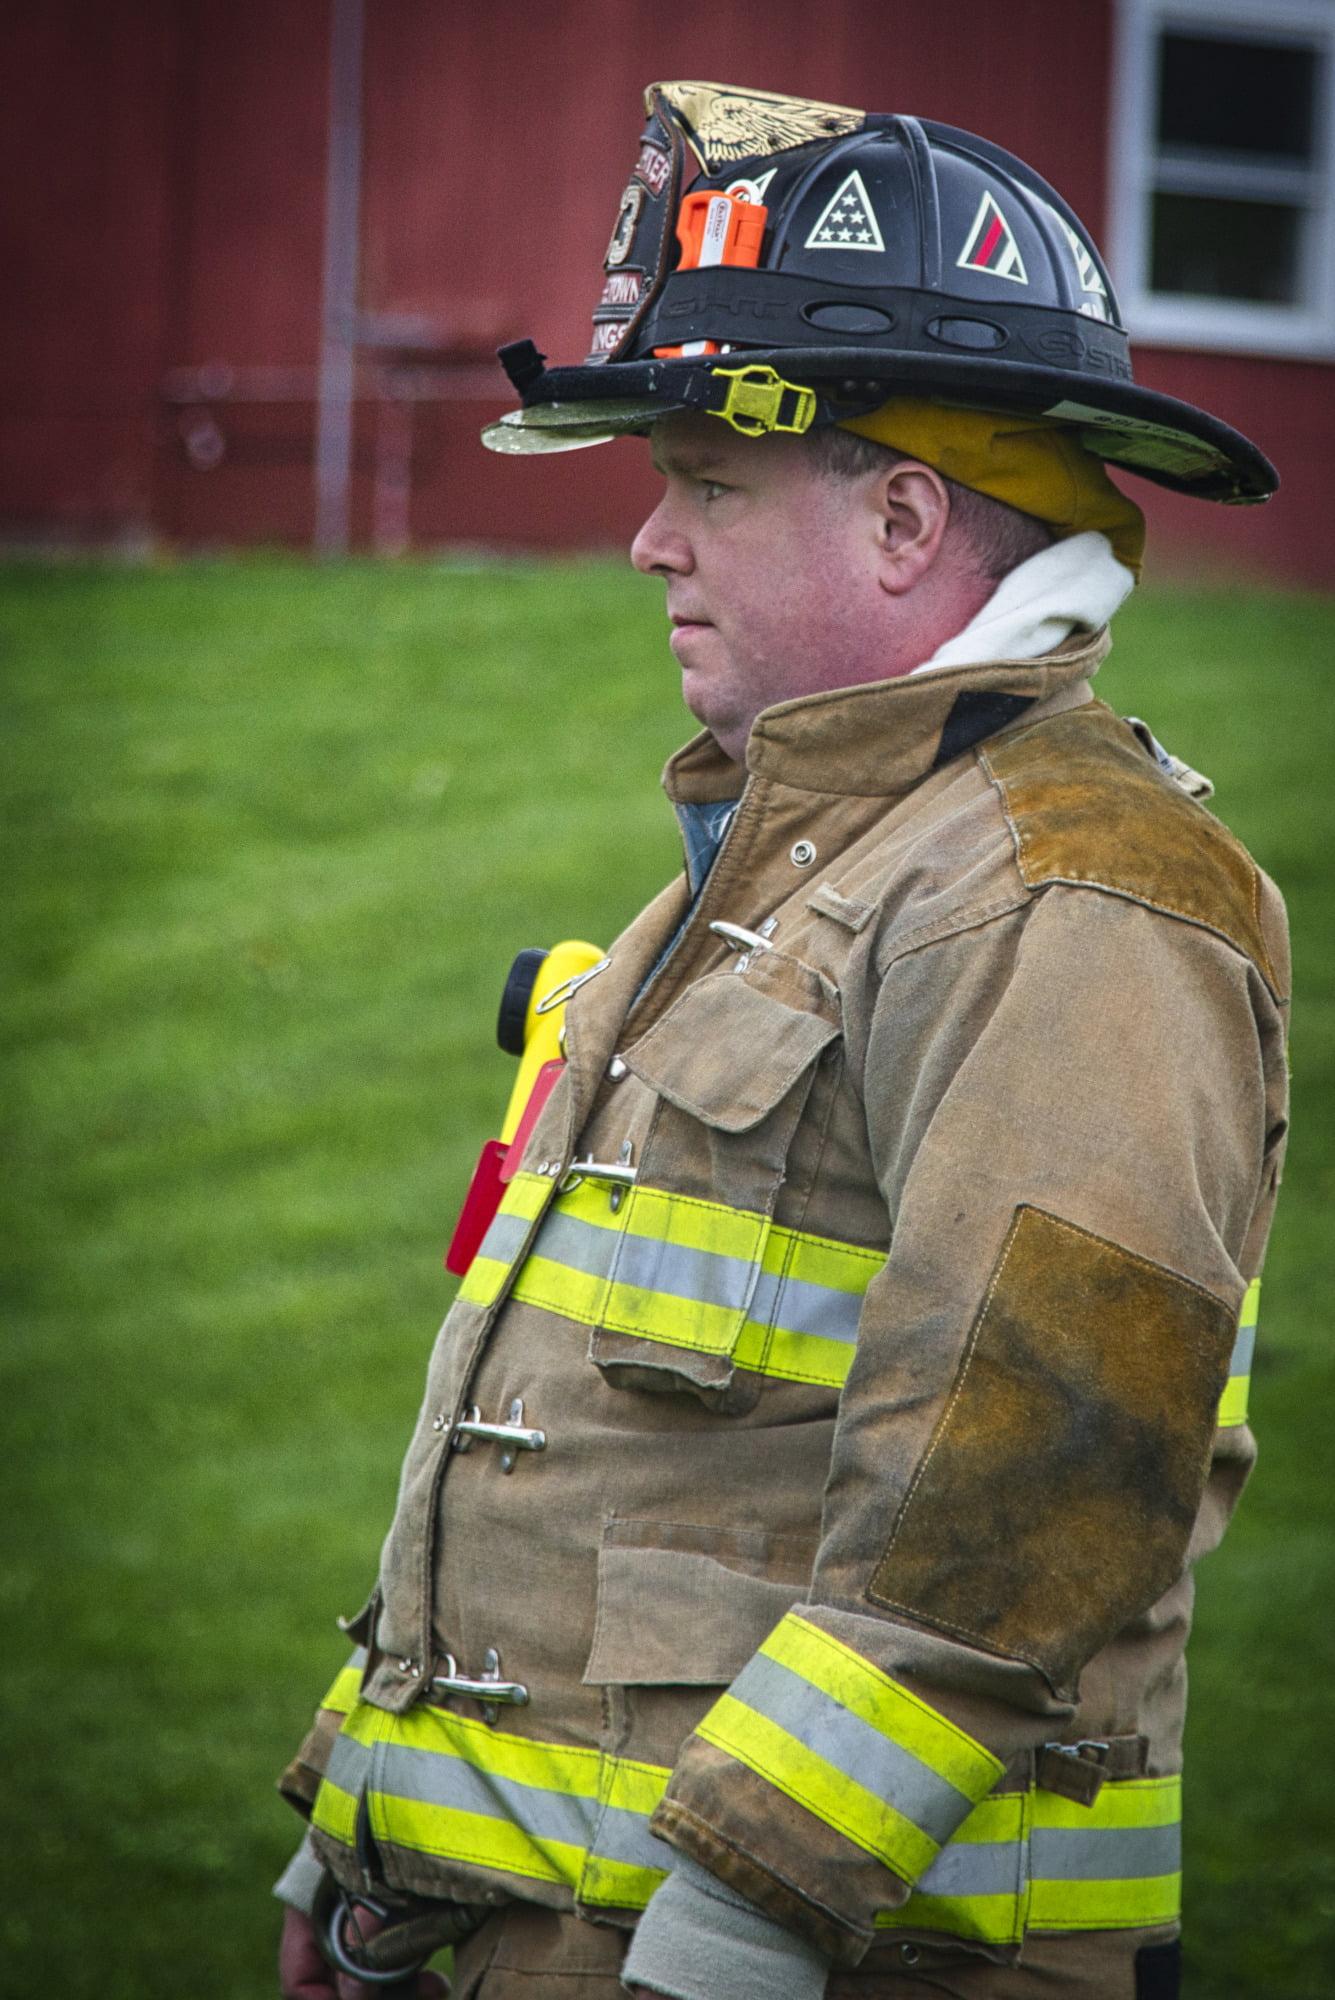 Middletown Springs Fire Department – Thomas Slatin